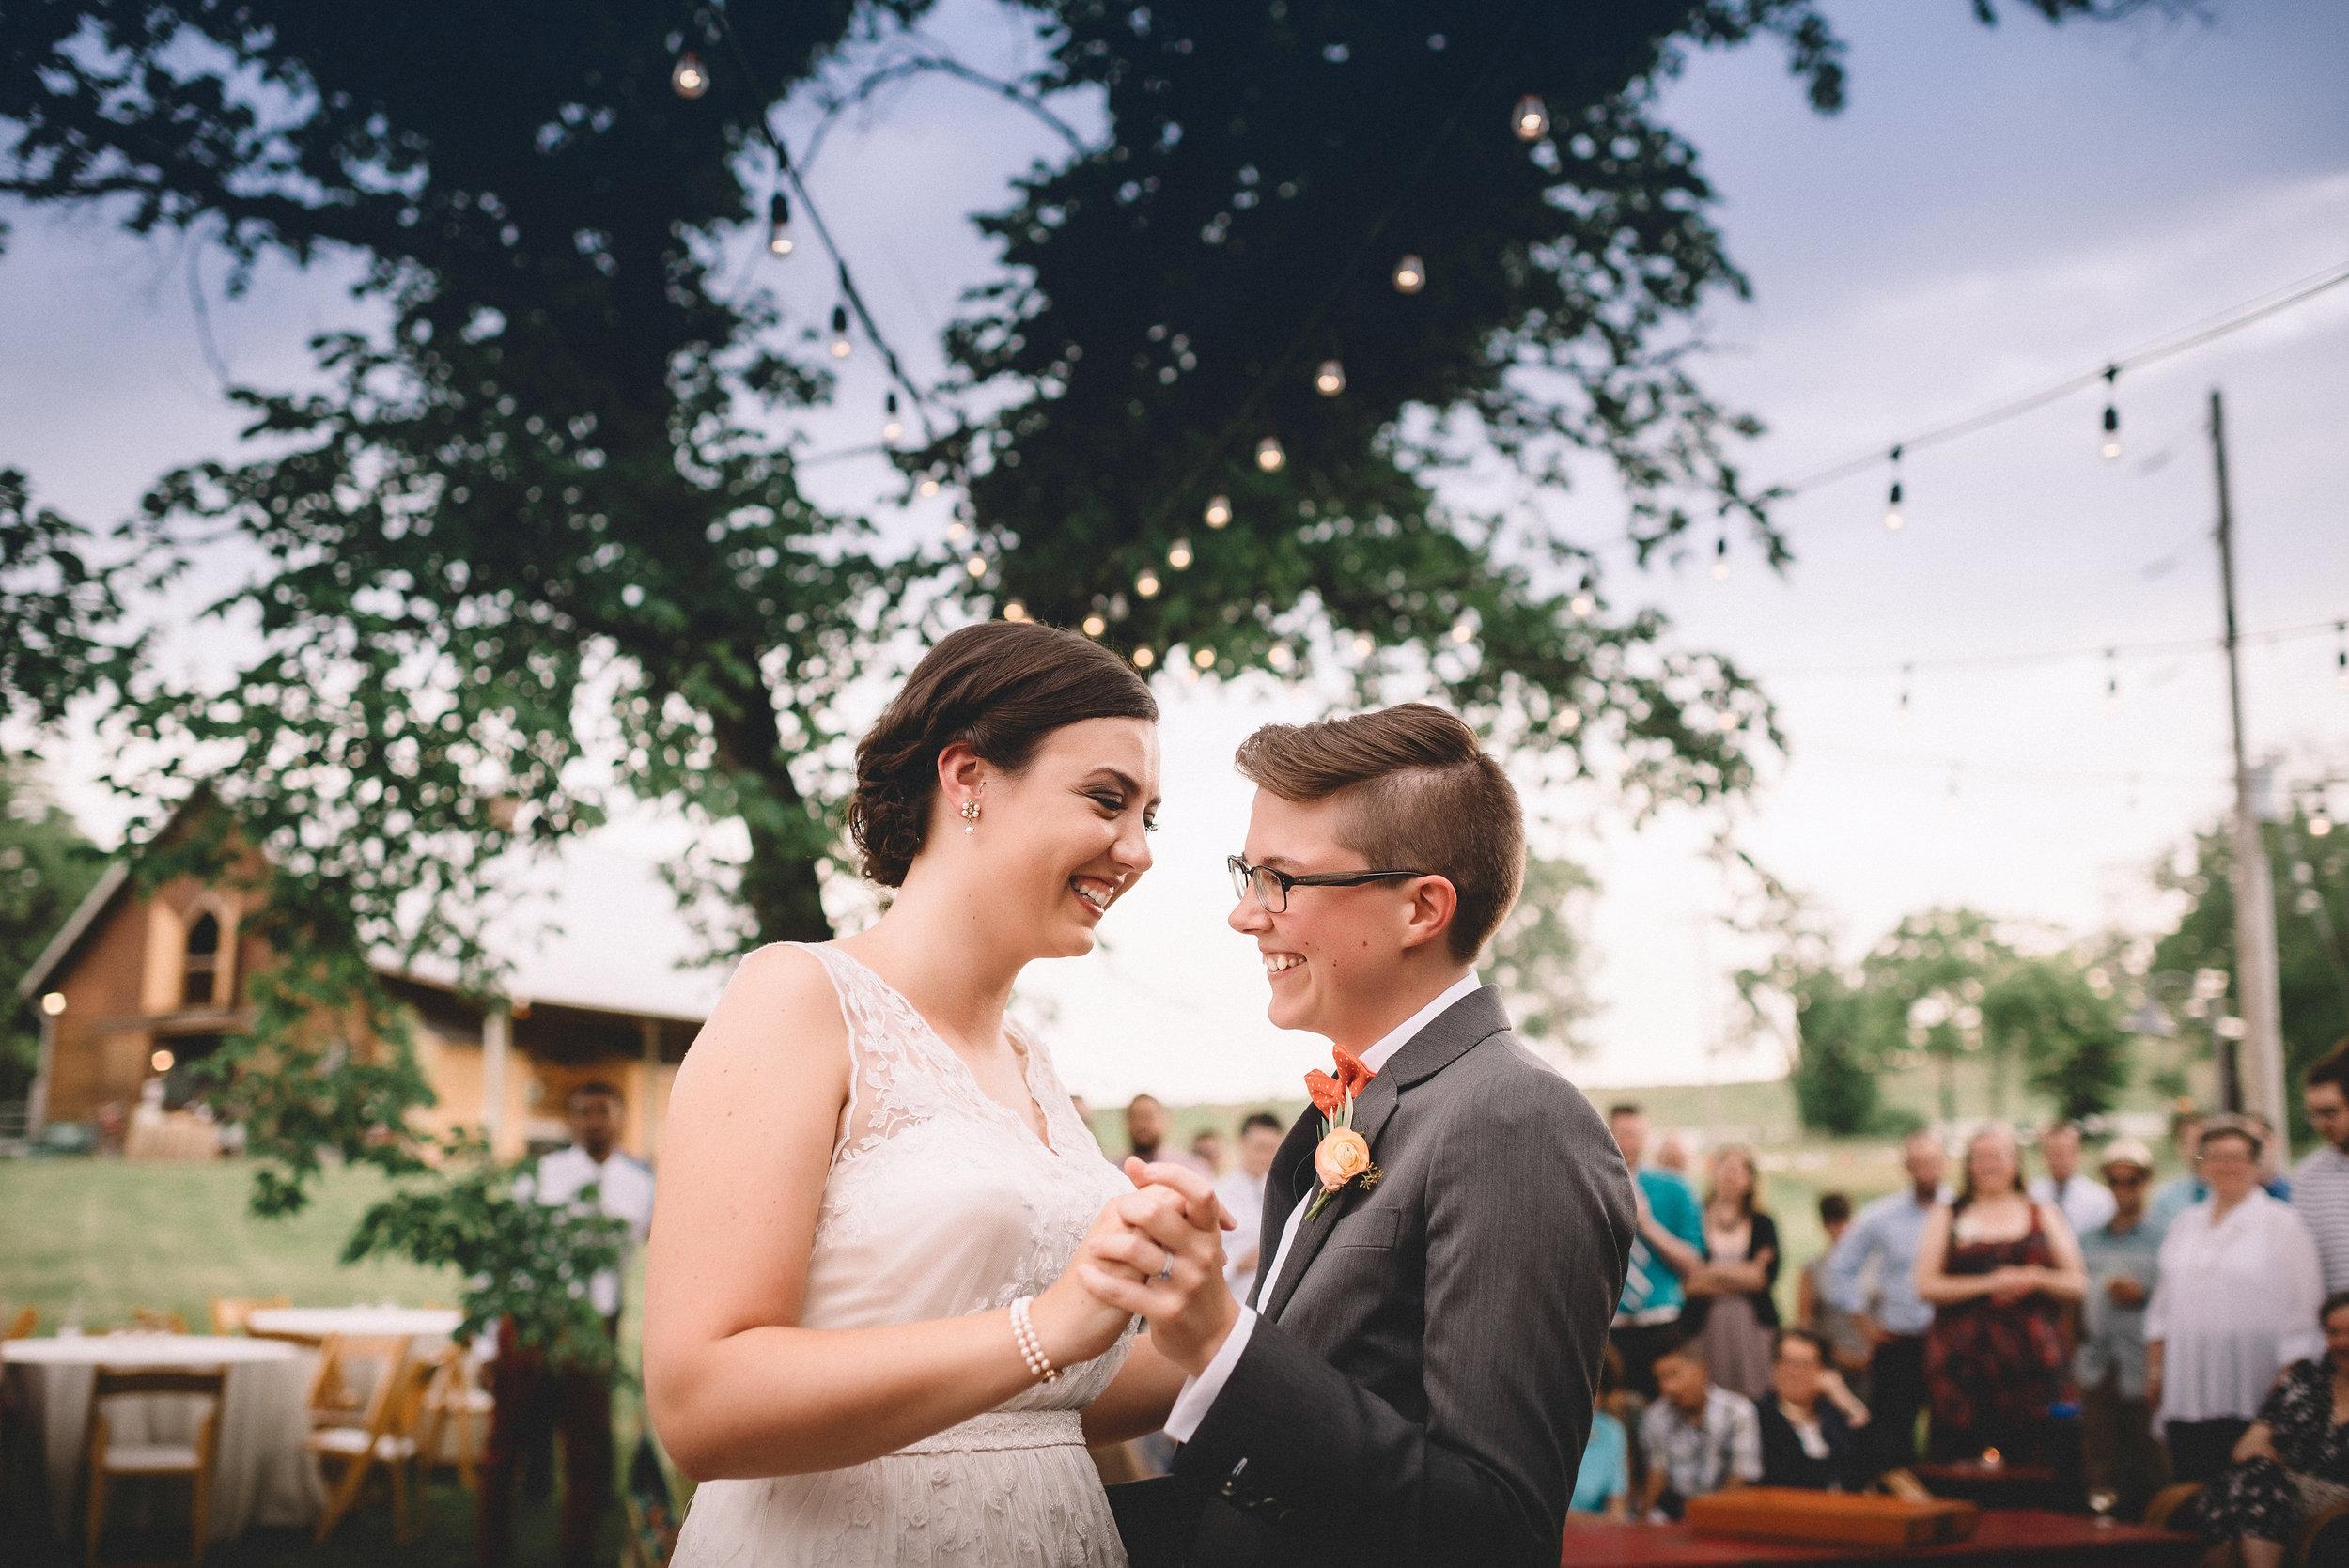 Lilly-Sadie-Wedding527.jpg